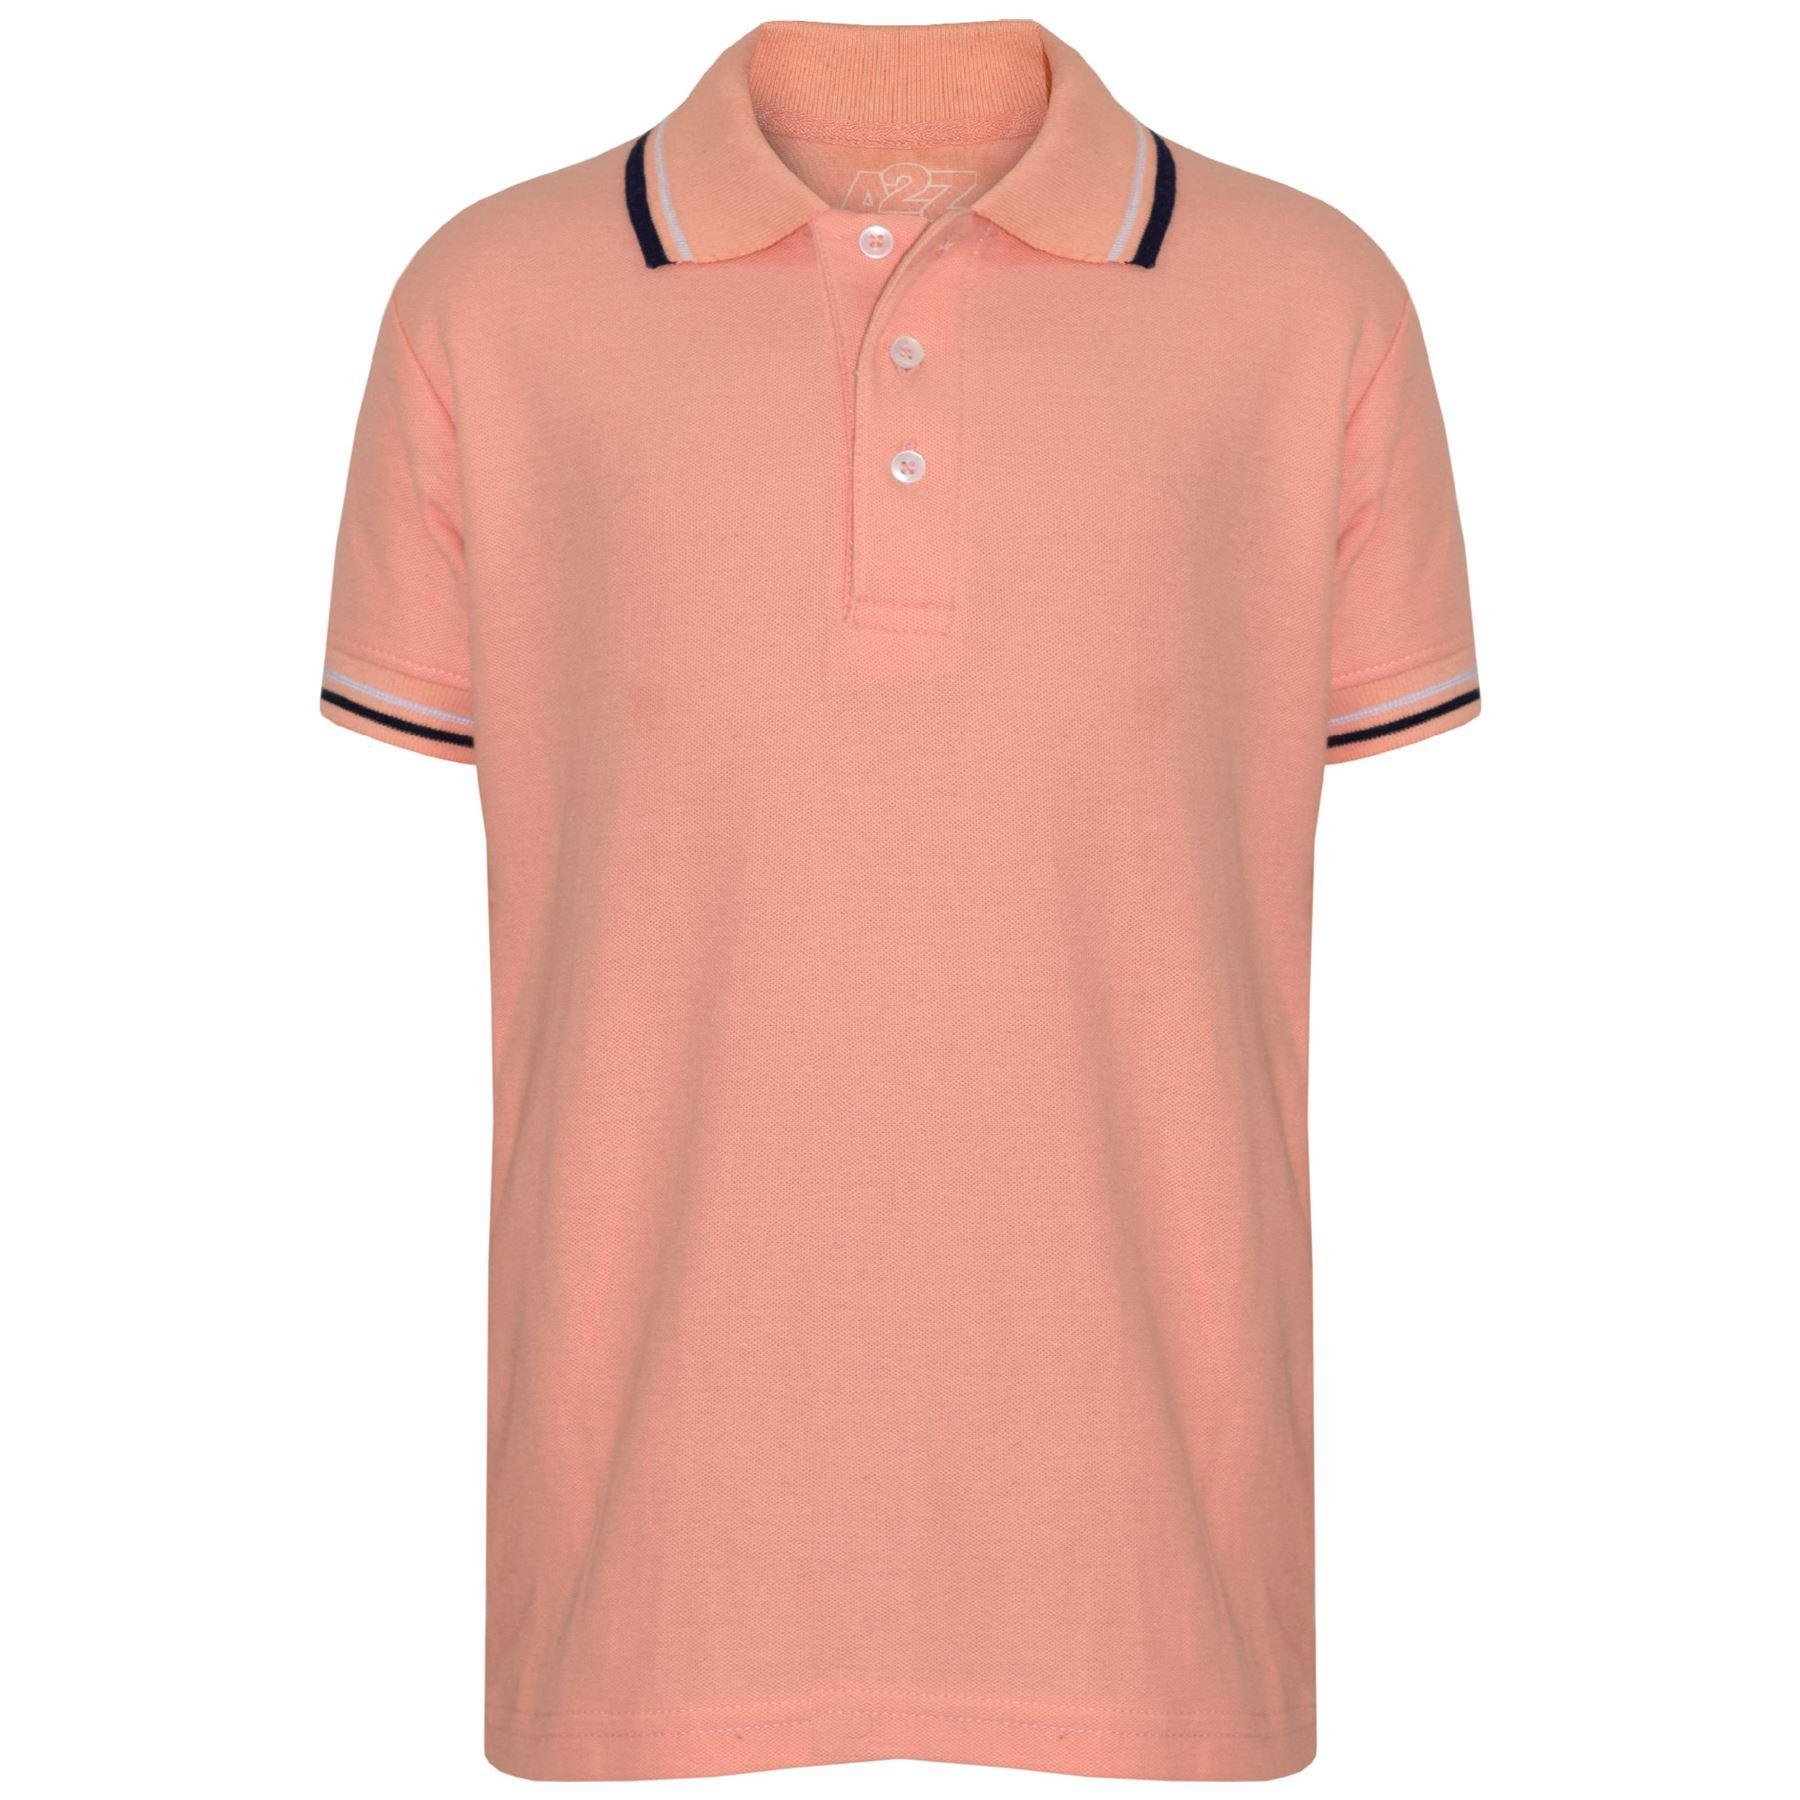 Kids Boys Girls Polo T Shirt Designer Plain Peach School T-Shirts PE ... 0e52d6256